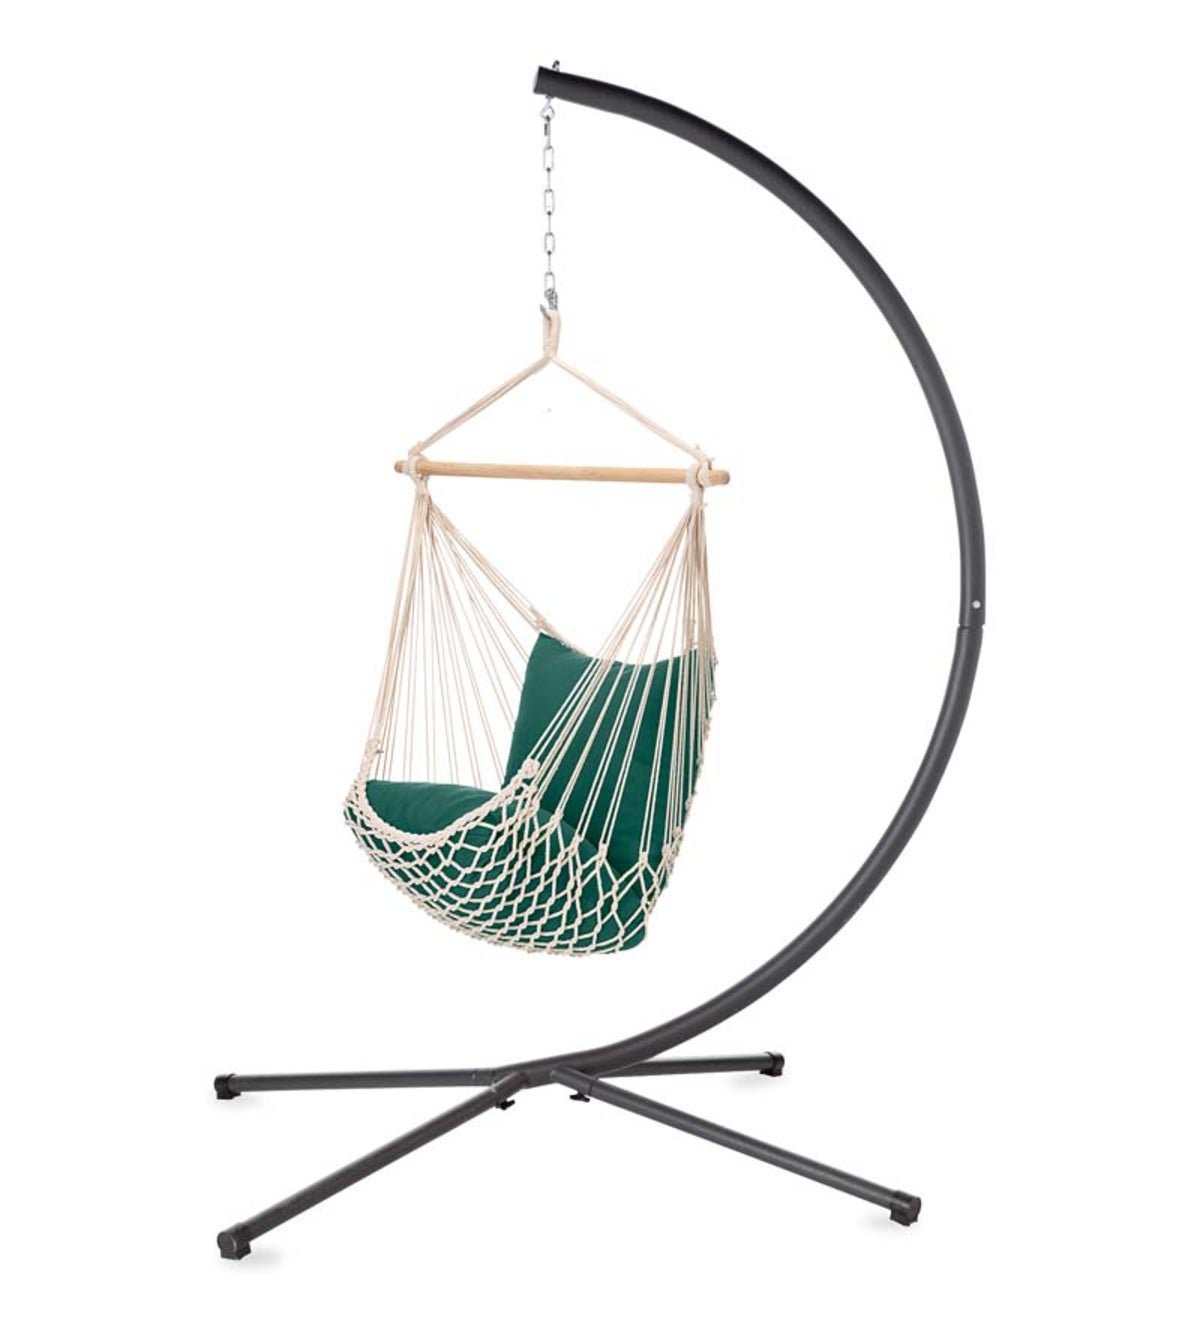 Green Striped Cotton Hammock Chair Swing Plowhearth